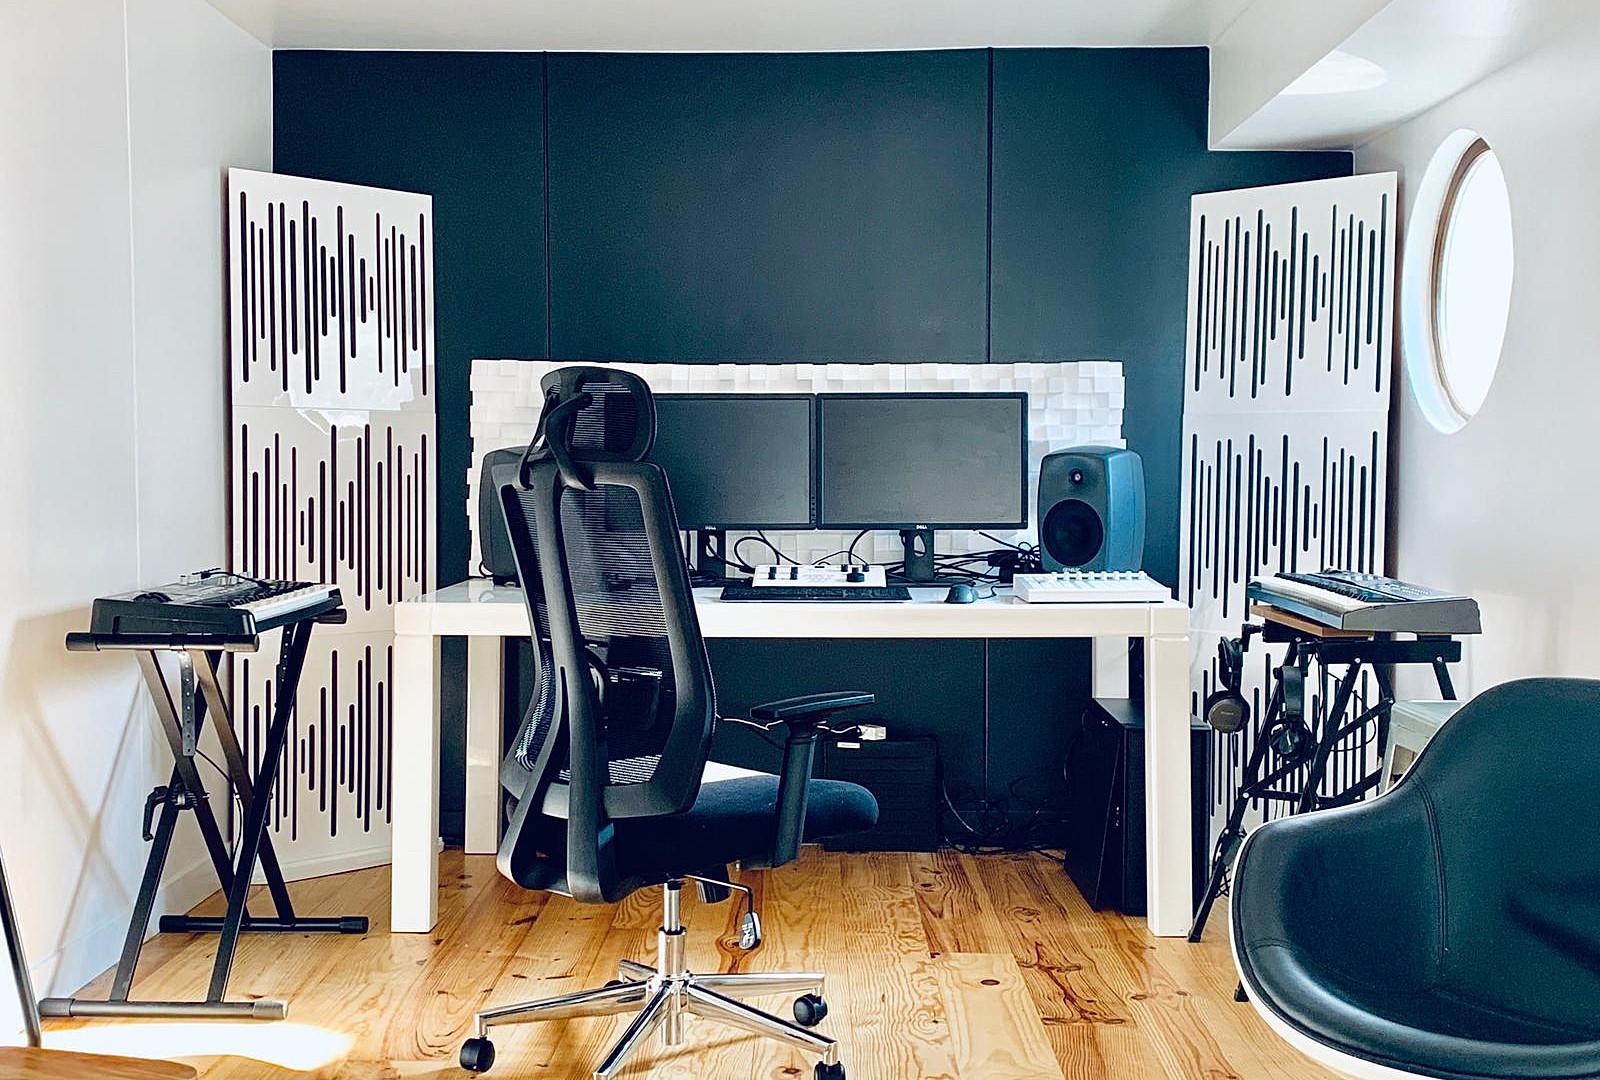 Studio Son.JPG